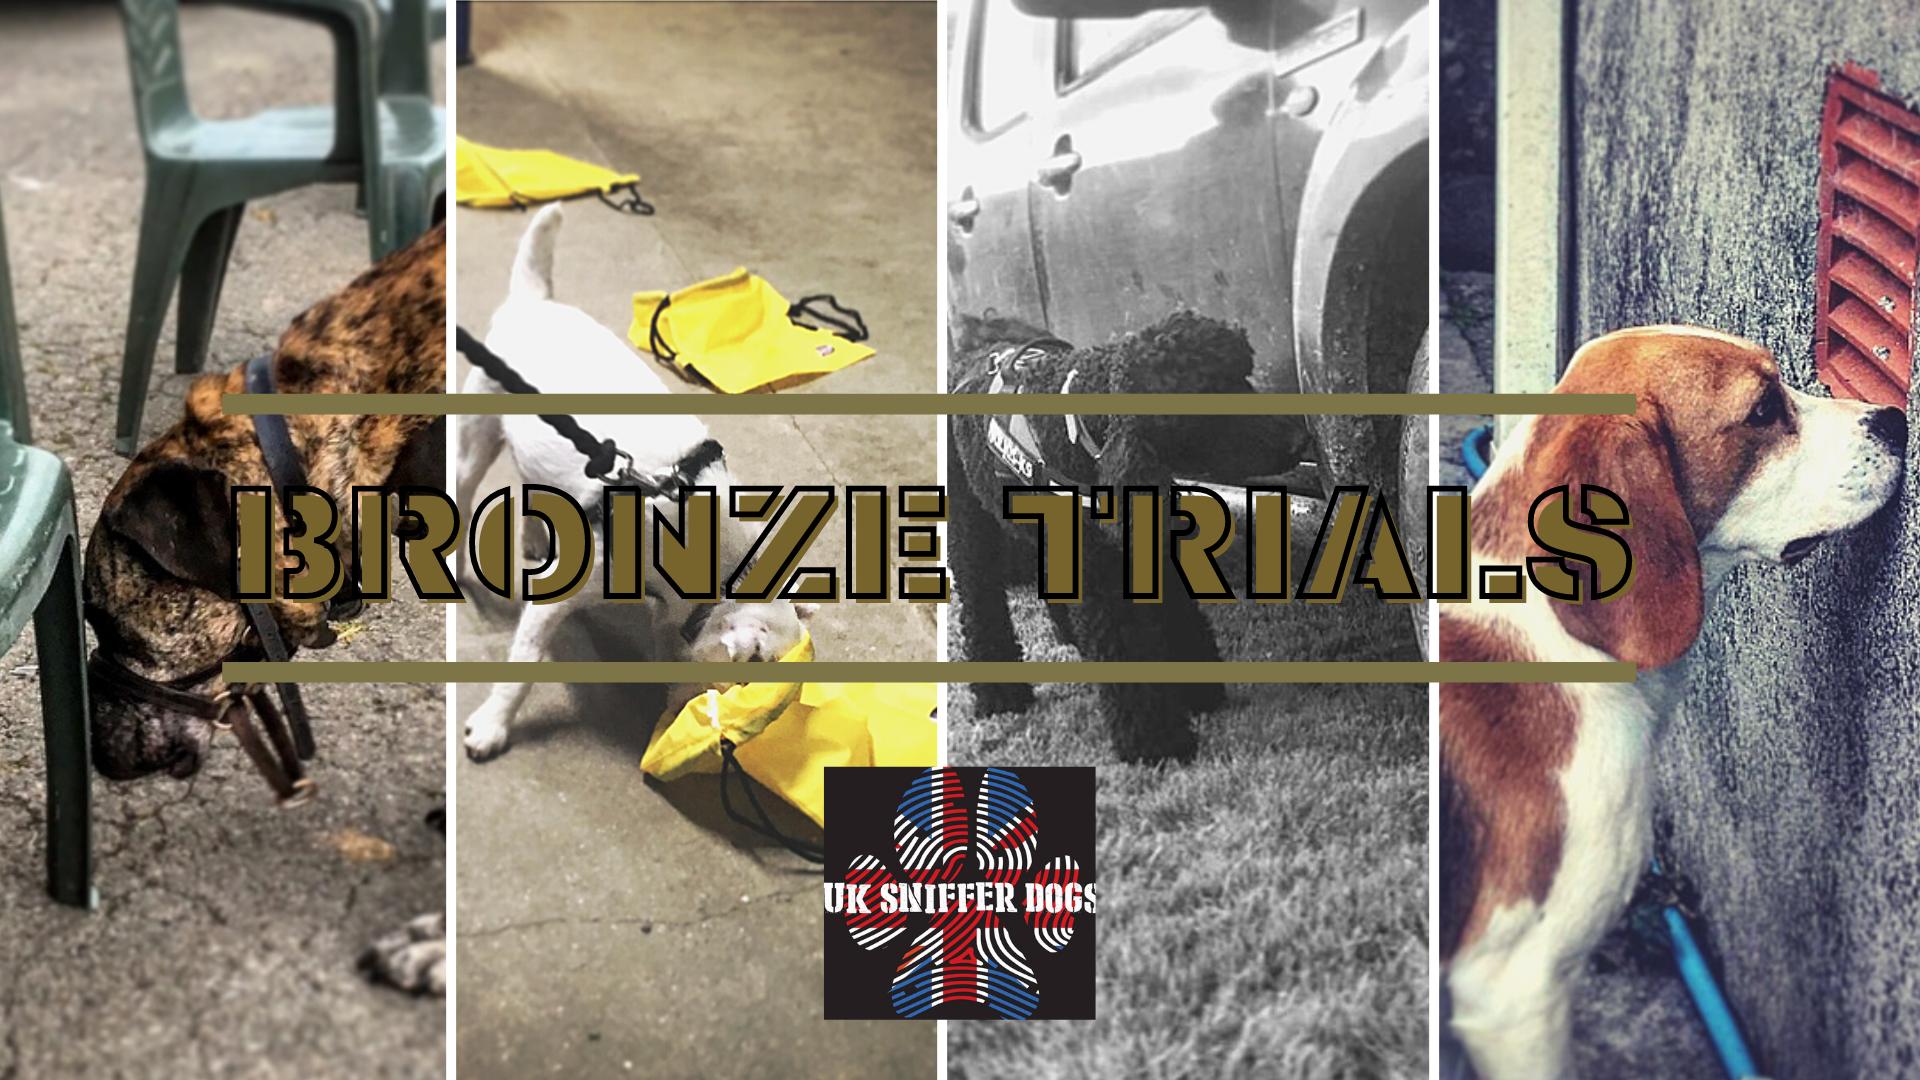 UK Sniffer Dogs - Bronze Trials